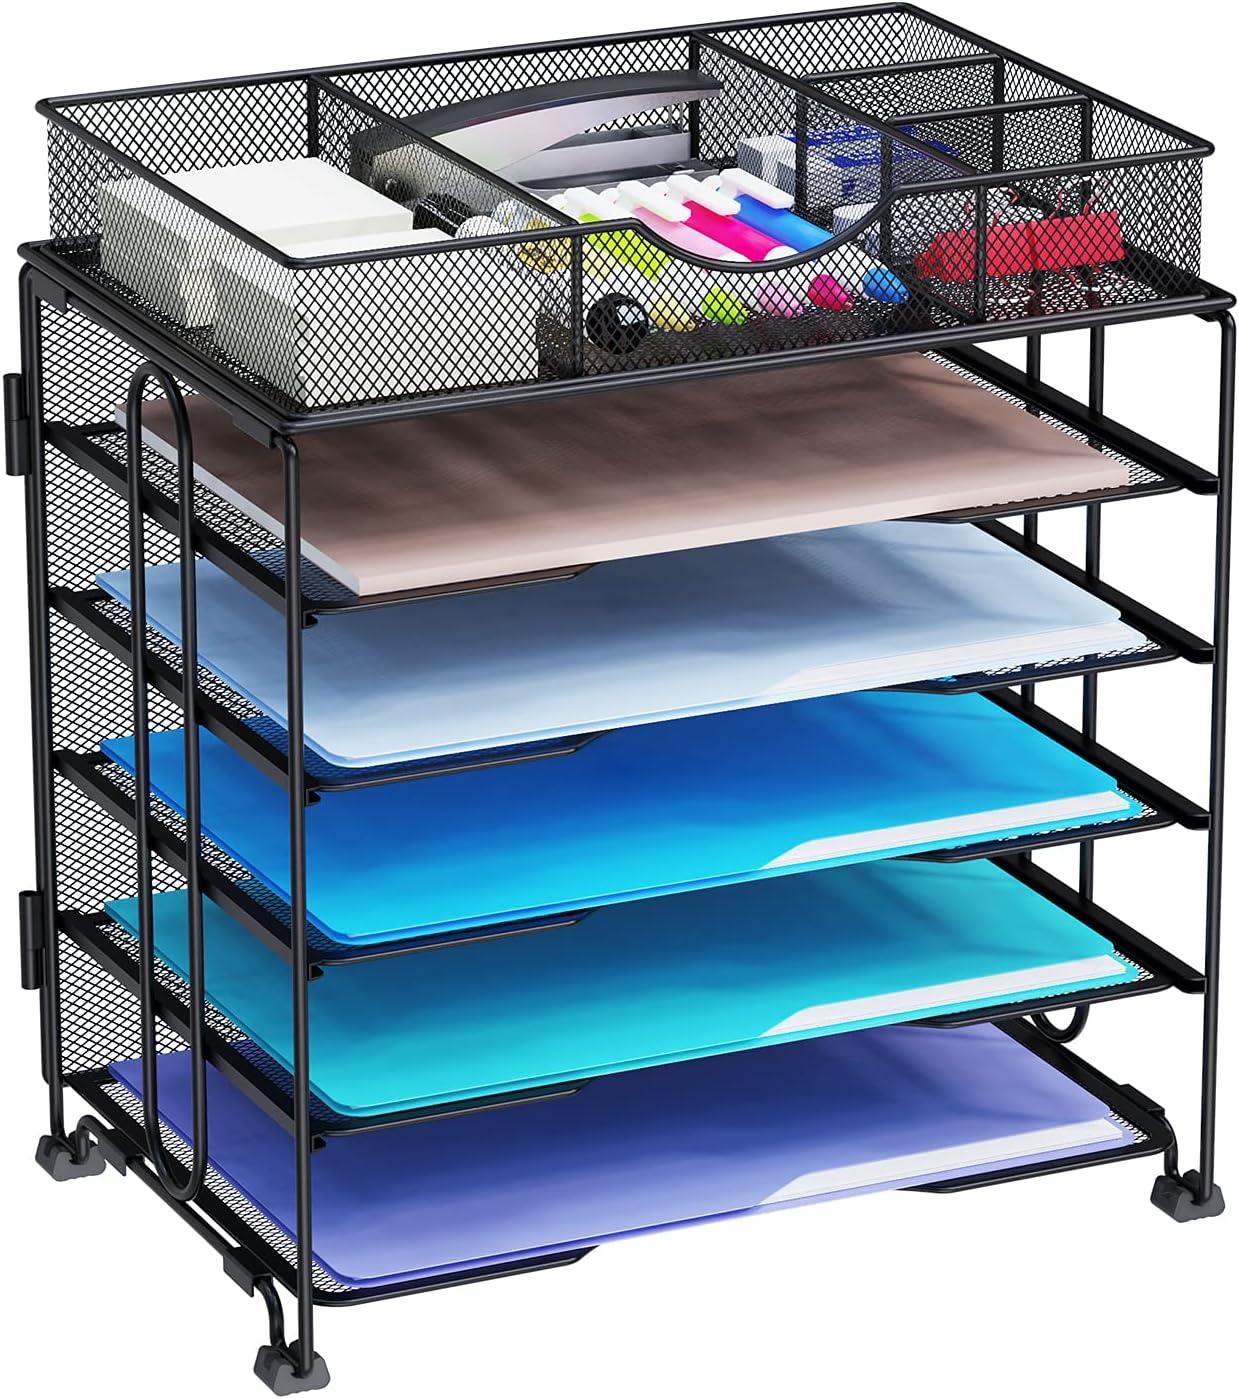 Kntiwiwo Paper Tray Organizer File Organizers for Desk 5-Tier Desktop File Organizer Metal Letter Tray Desk Organizers   Screws Free Design, Black…